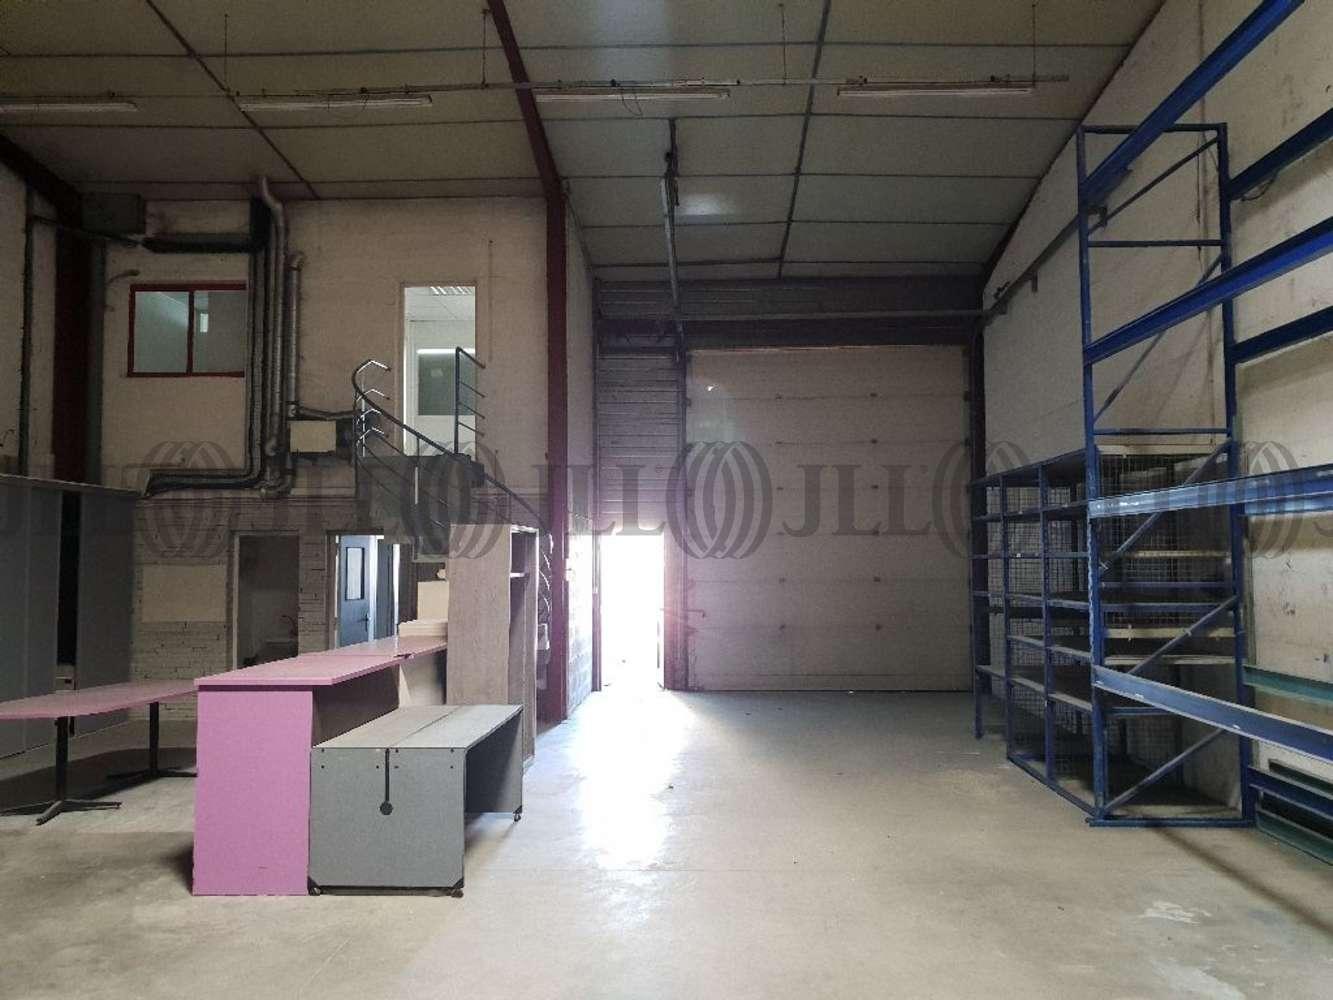 Activités/entrepôt Chassieu, 69680 - Location entrepot Chassieu (69) - 10032126